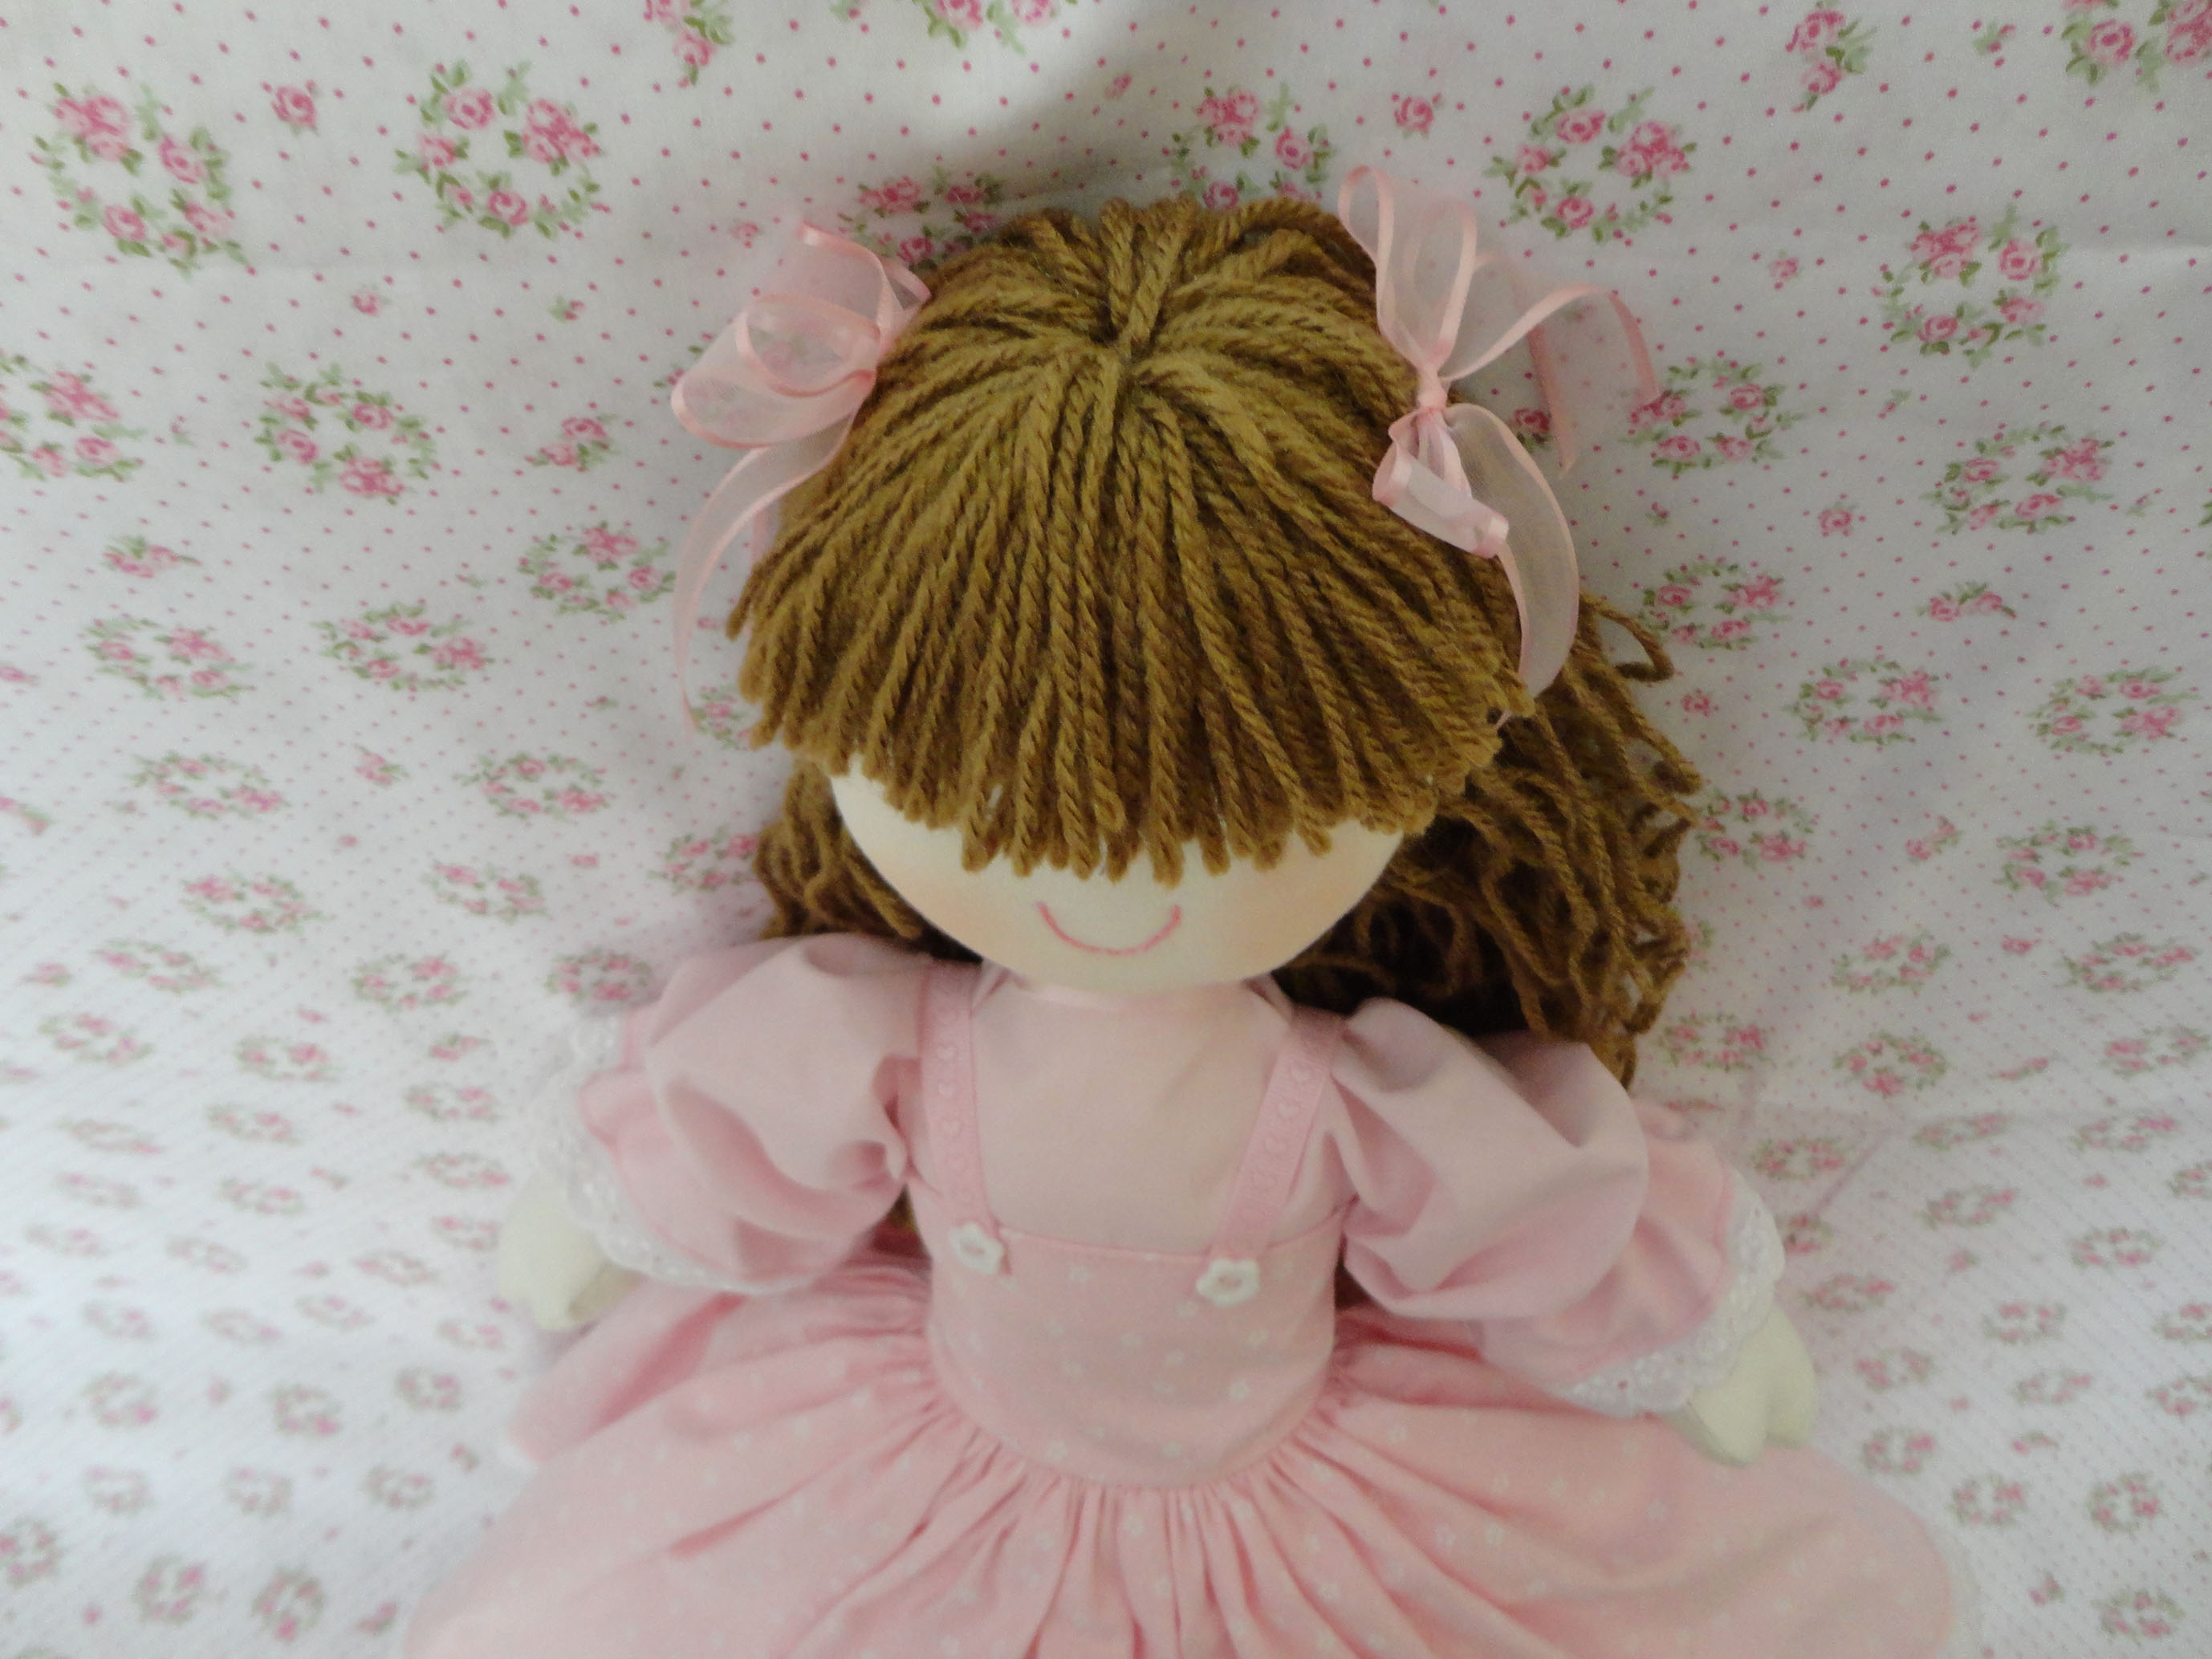 boneca-de-pano-menina boneca-de-pano-boneca